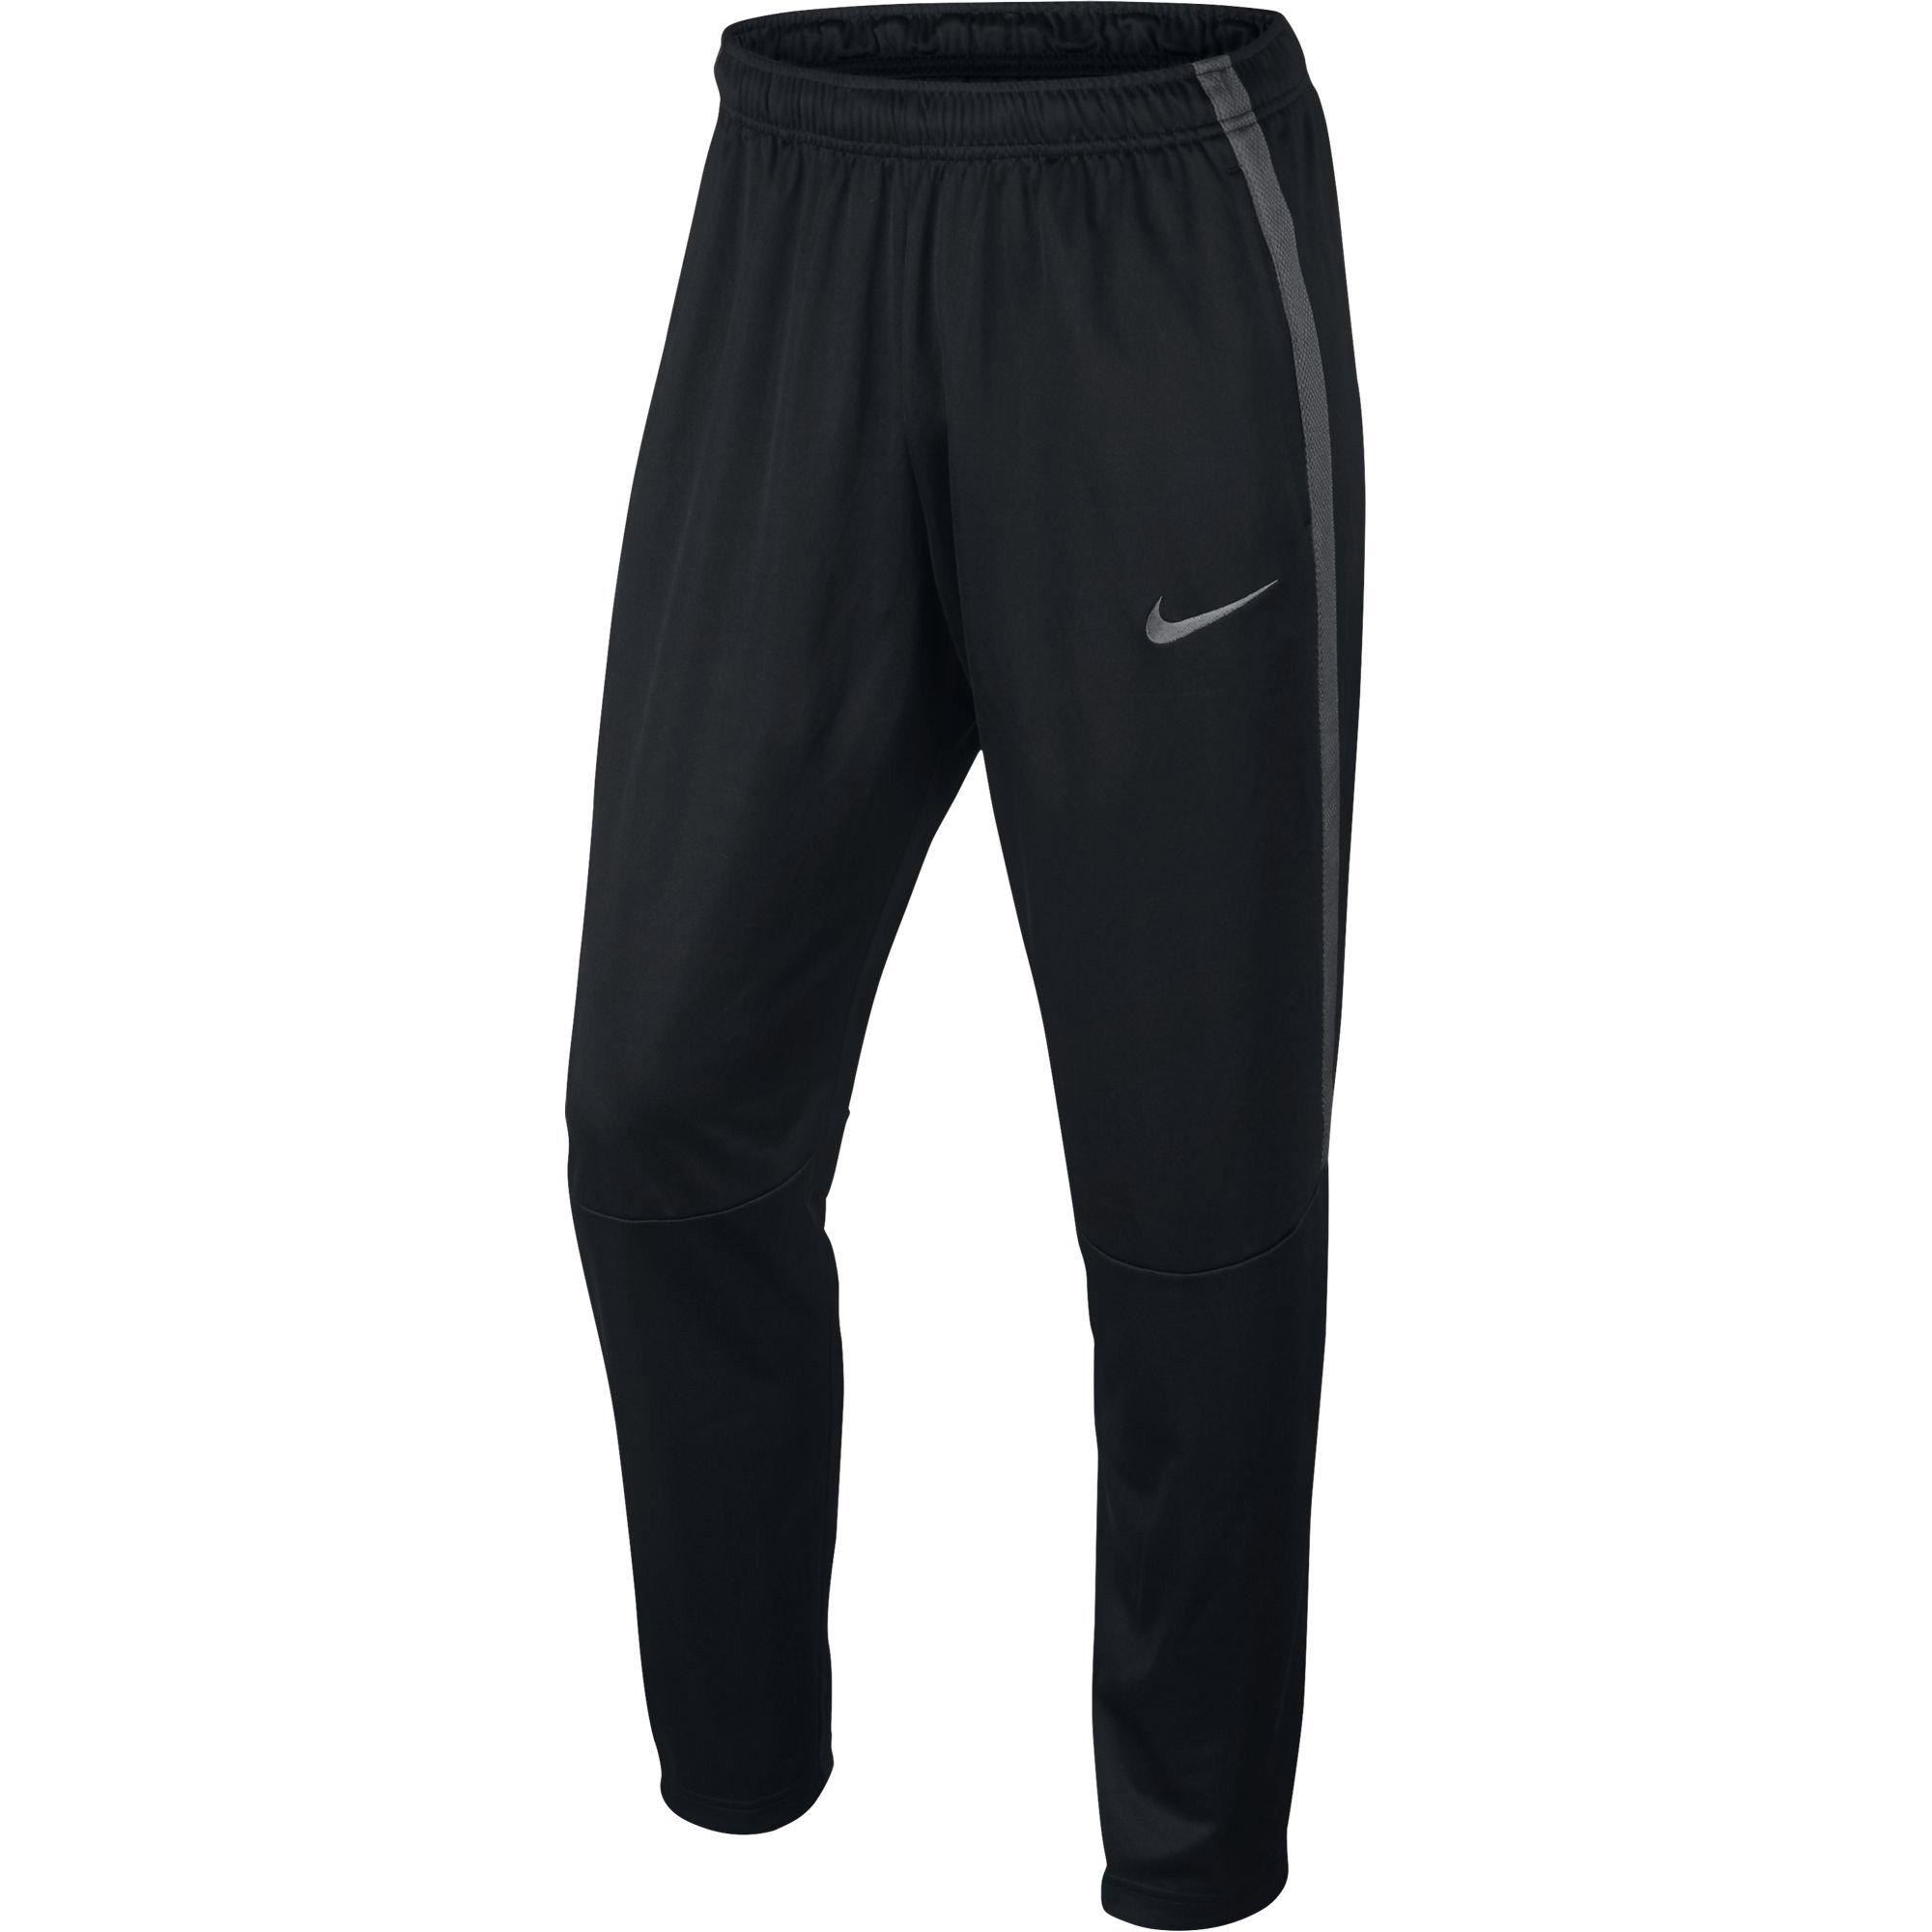 NIKE Men's Epic Knit Pants, Black/Dark Grey/Black/Dark Grey, Medium